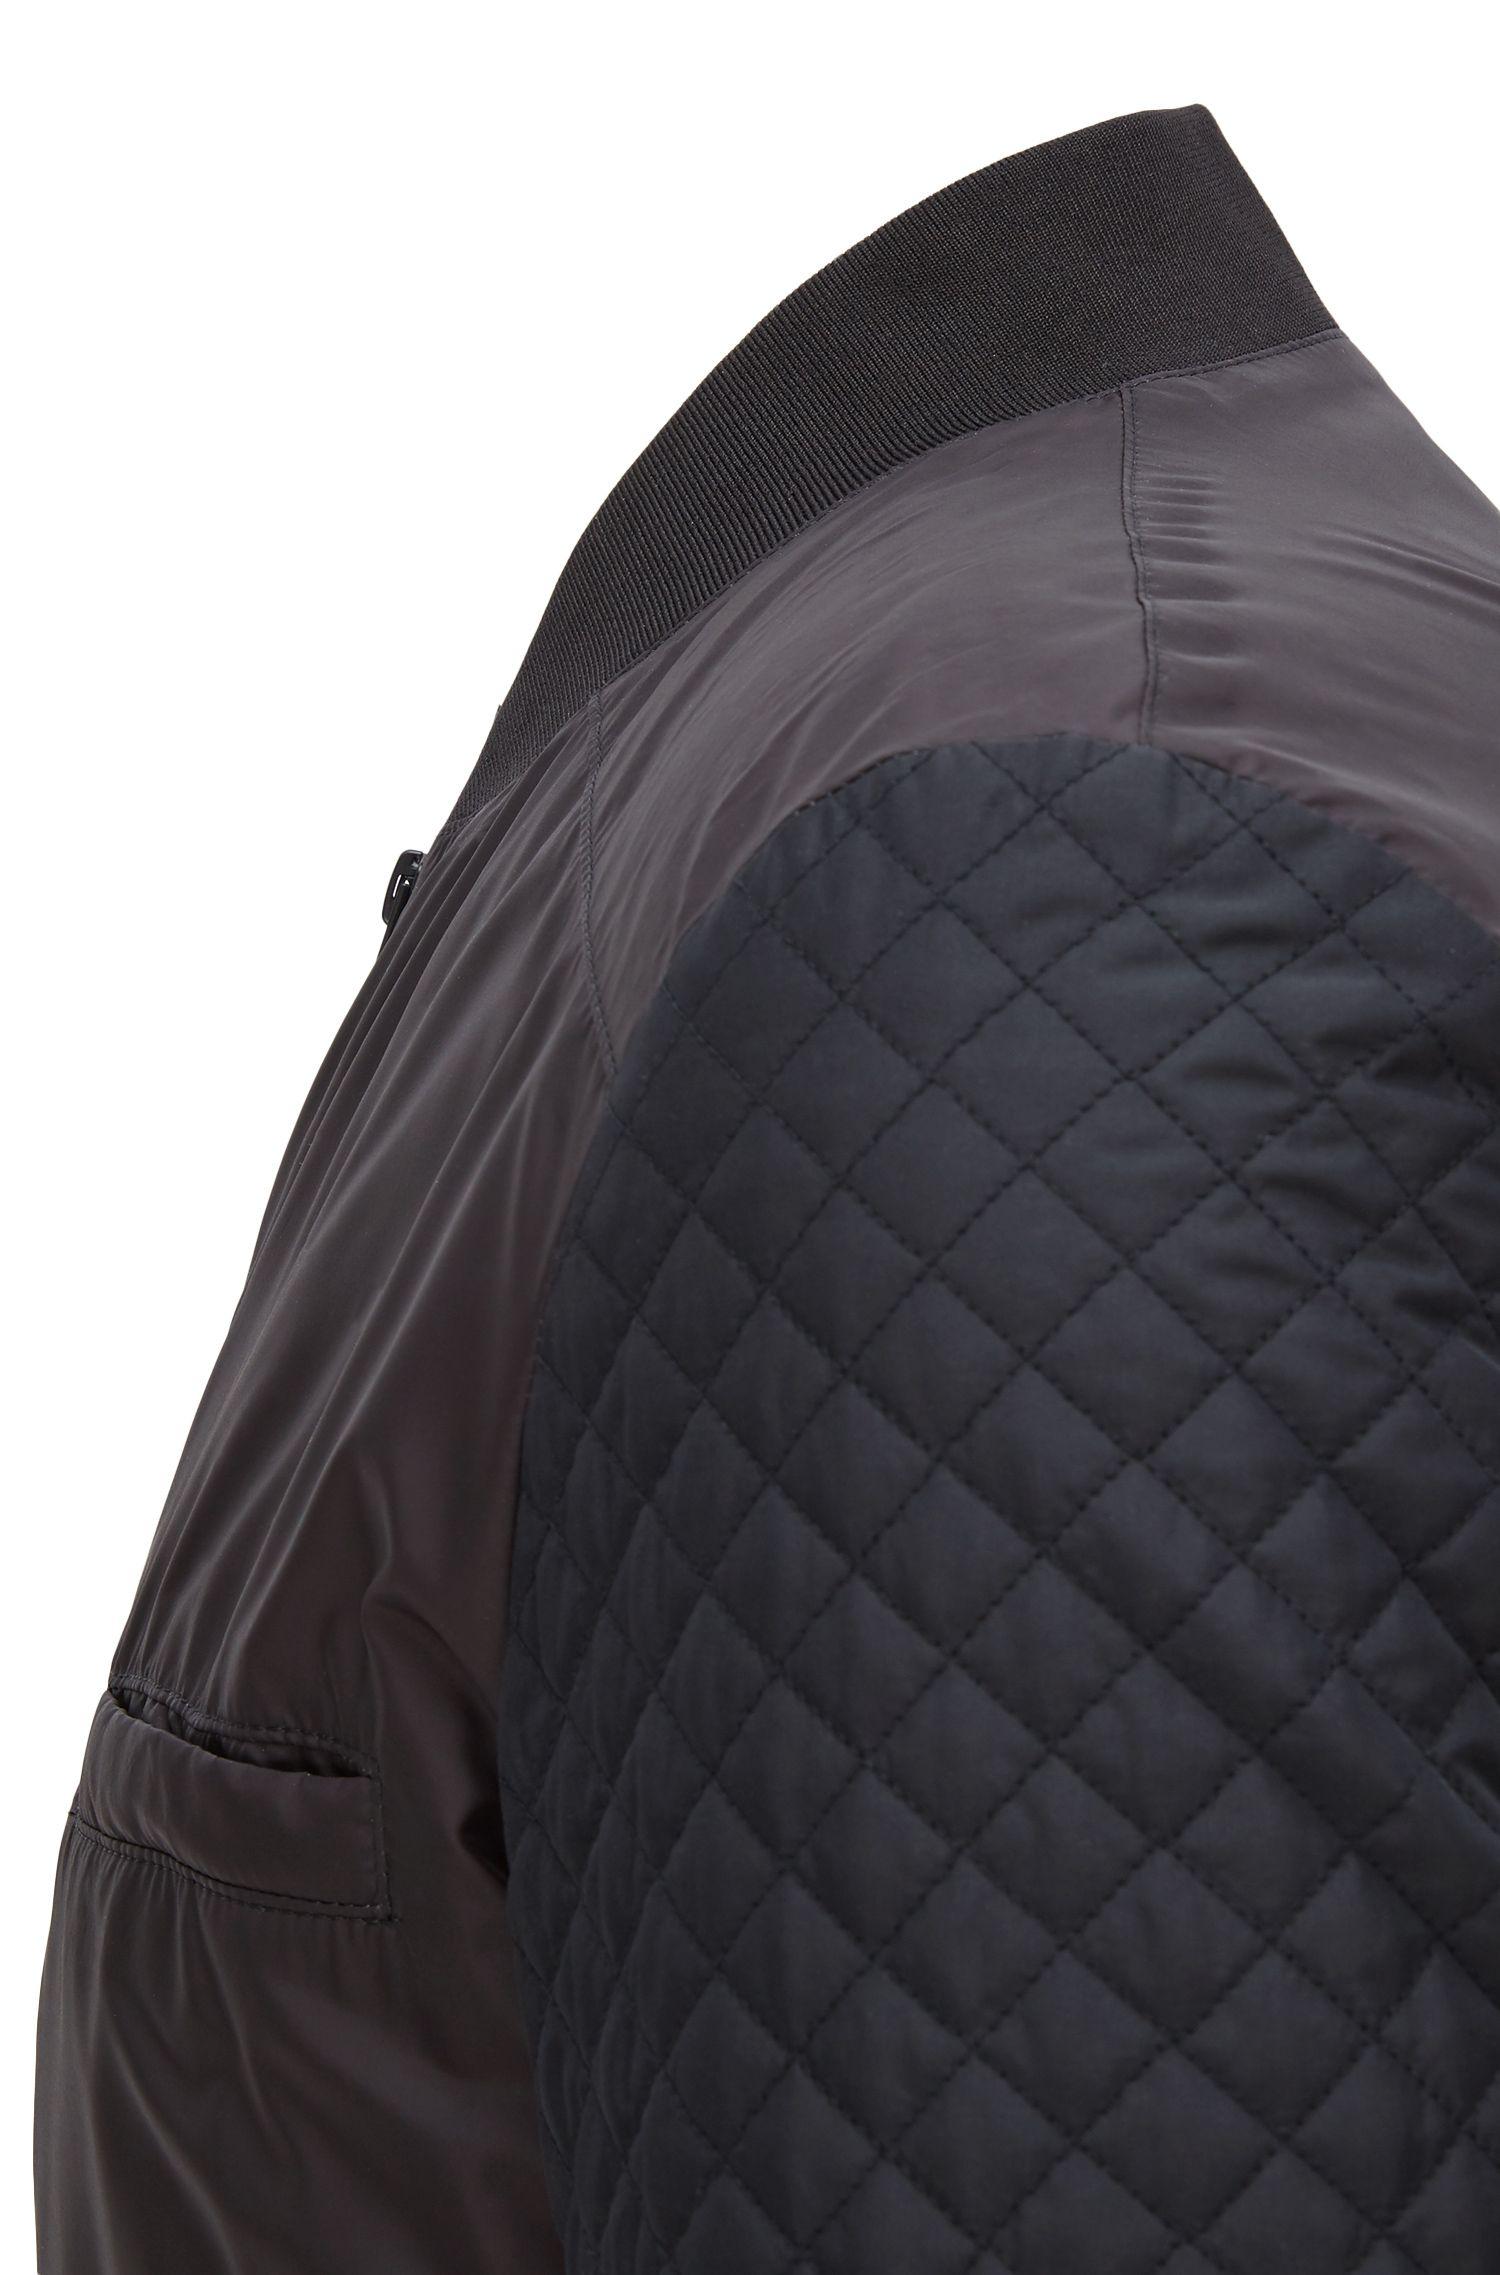 Quilted Nylon Bomber Jacket | Belko Print